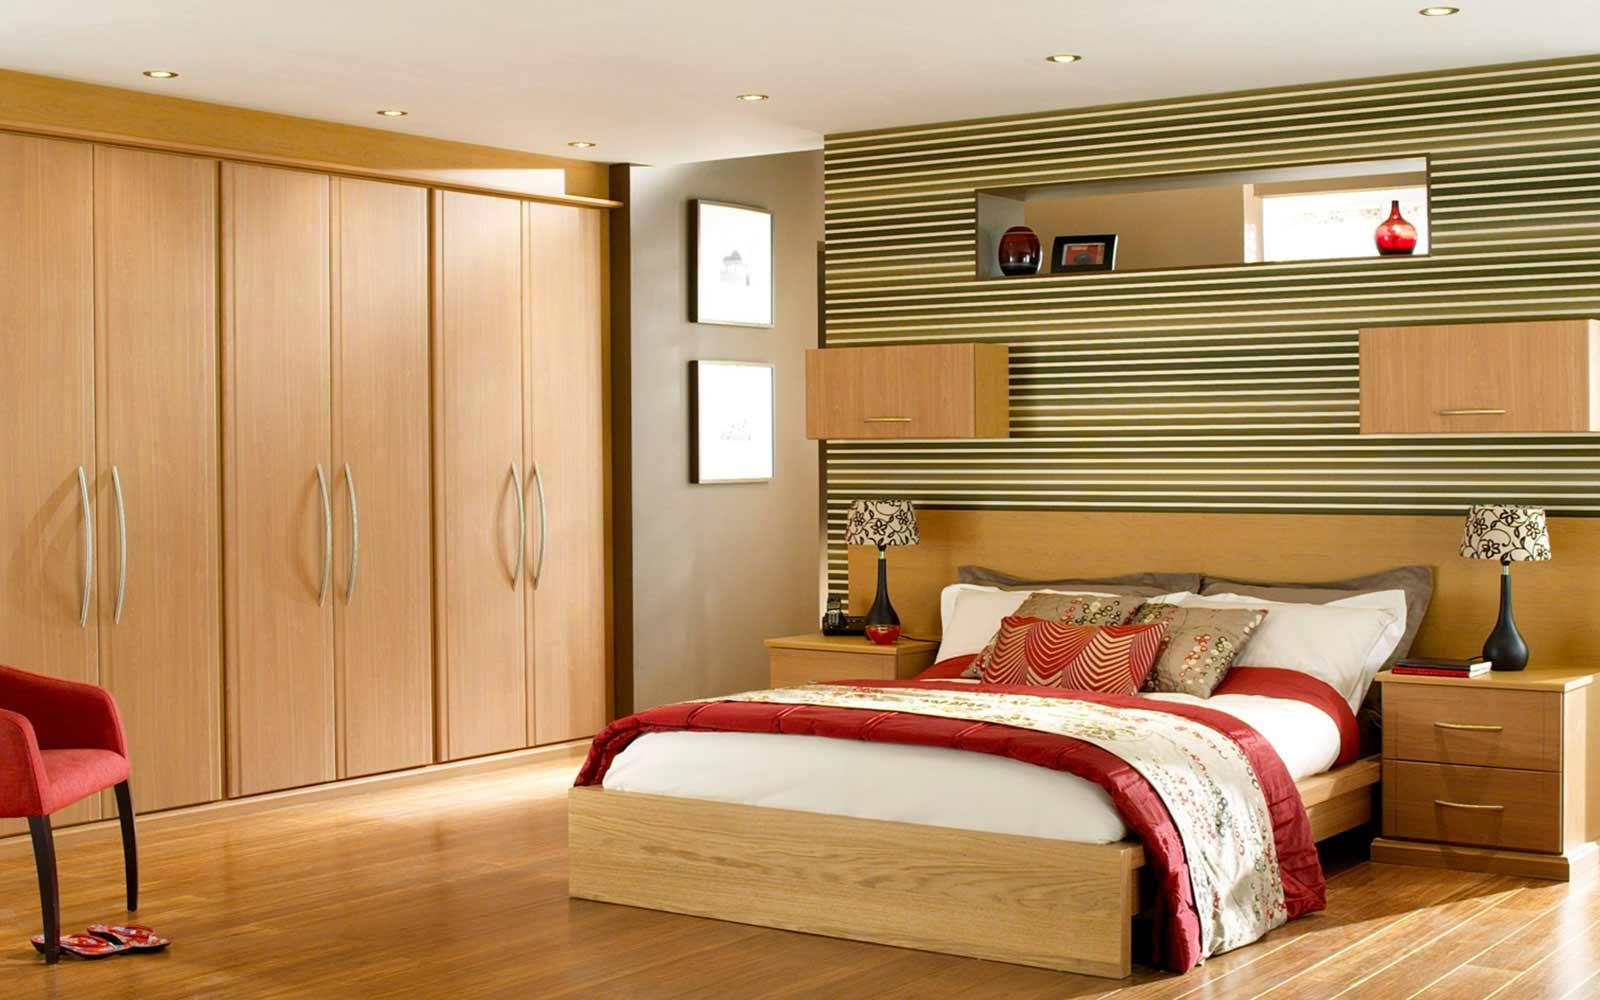 35+ Images Of Wardrobe Designs For Bedrooms on Simple Best Bedroom Design  id=89717